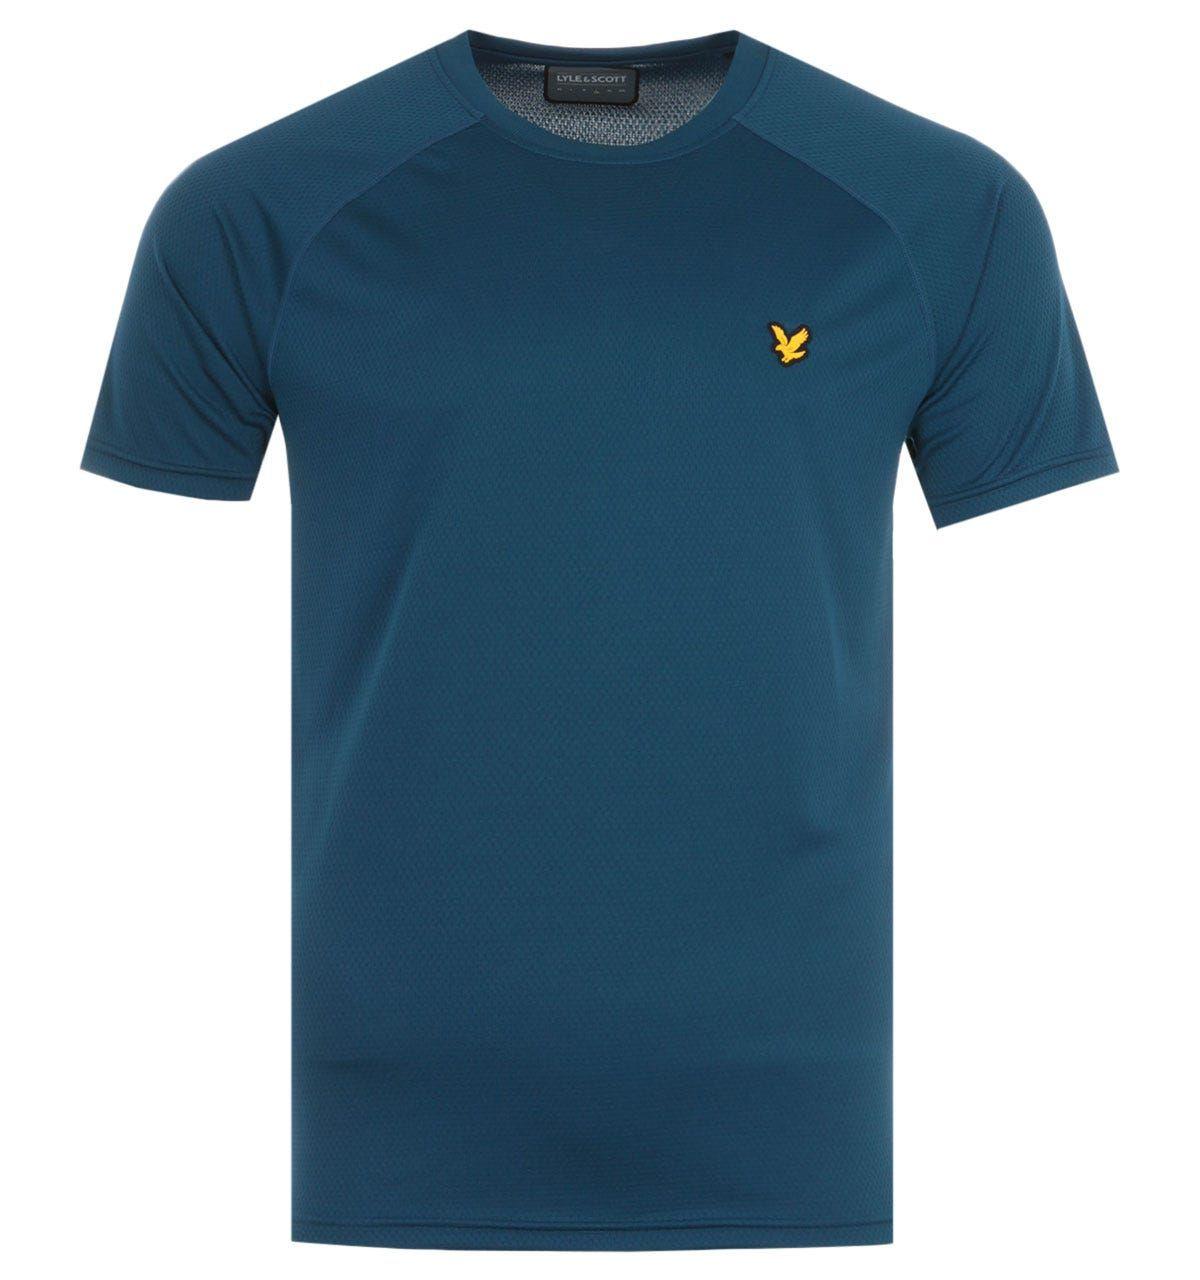 Lyle & Scott Core Raglan T-Shirt - Deep Fjord